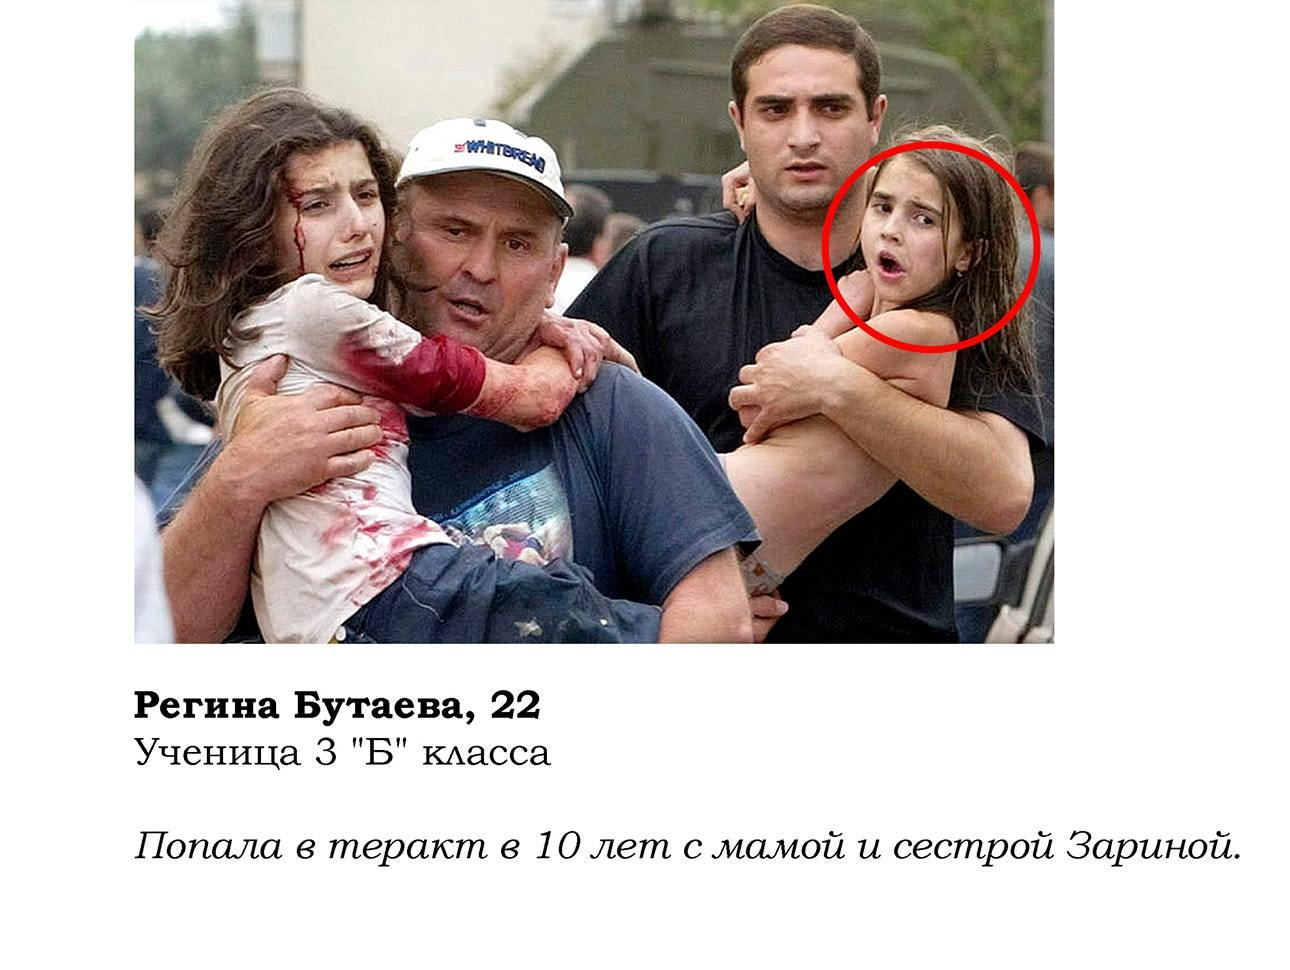 террористический акт в беслане фото